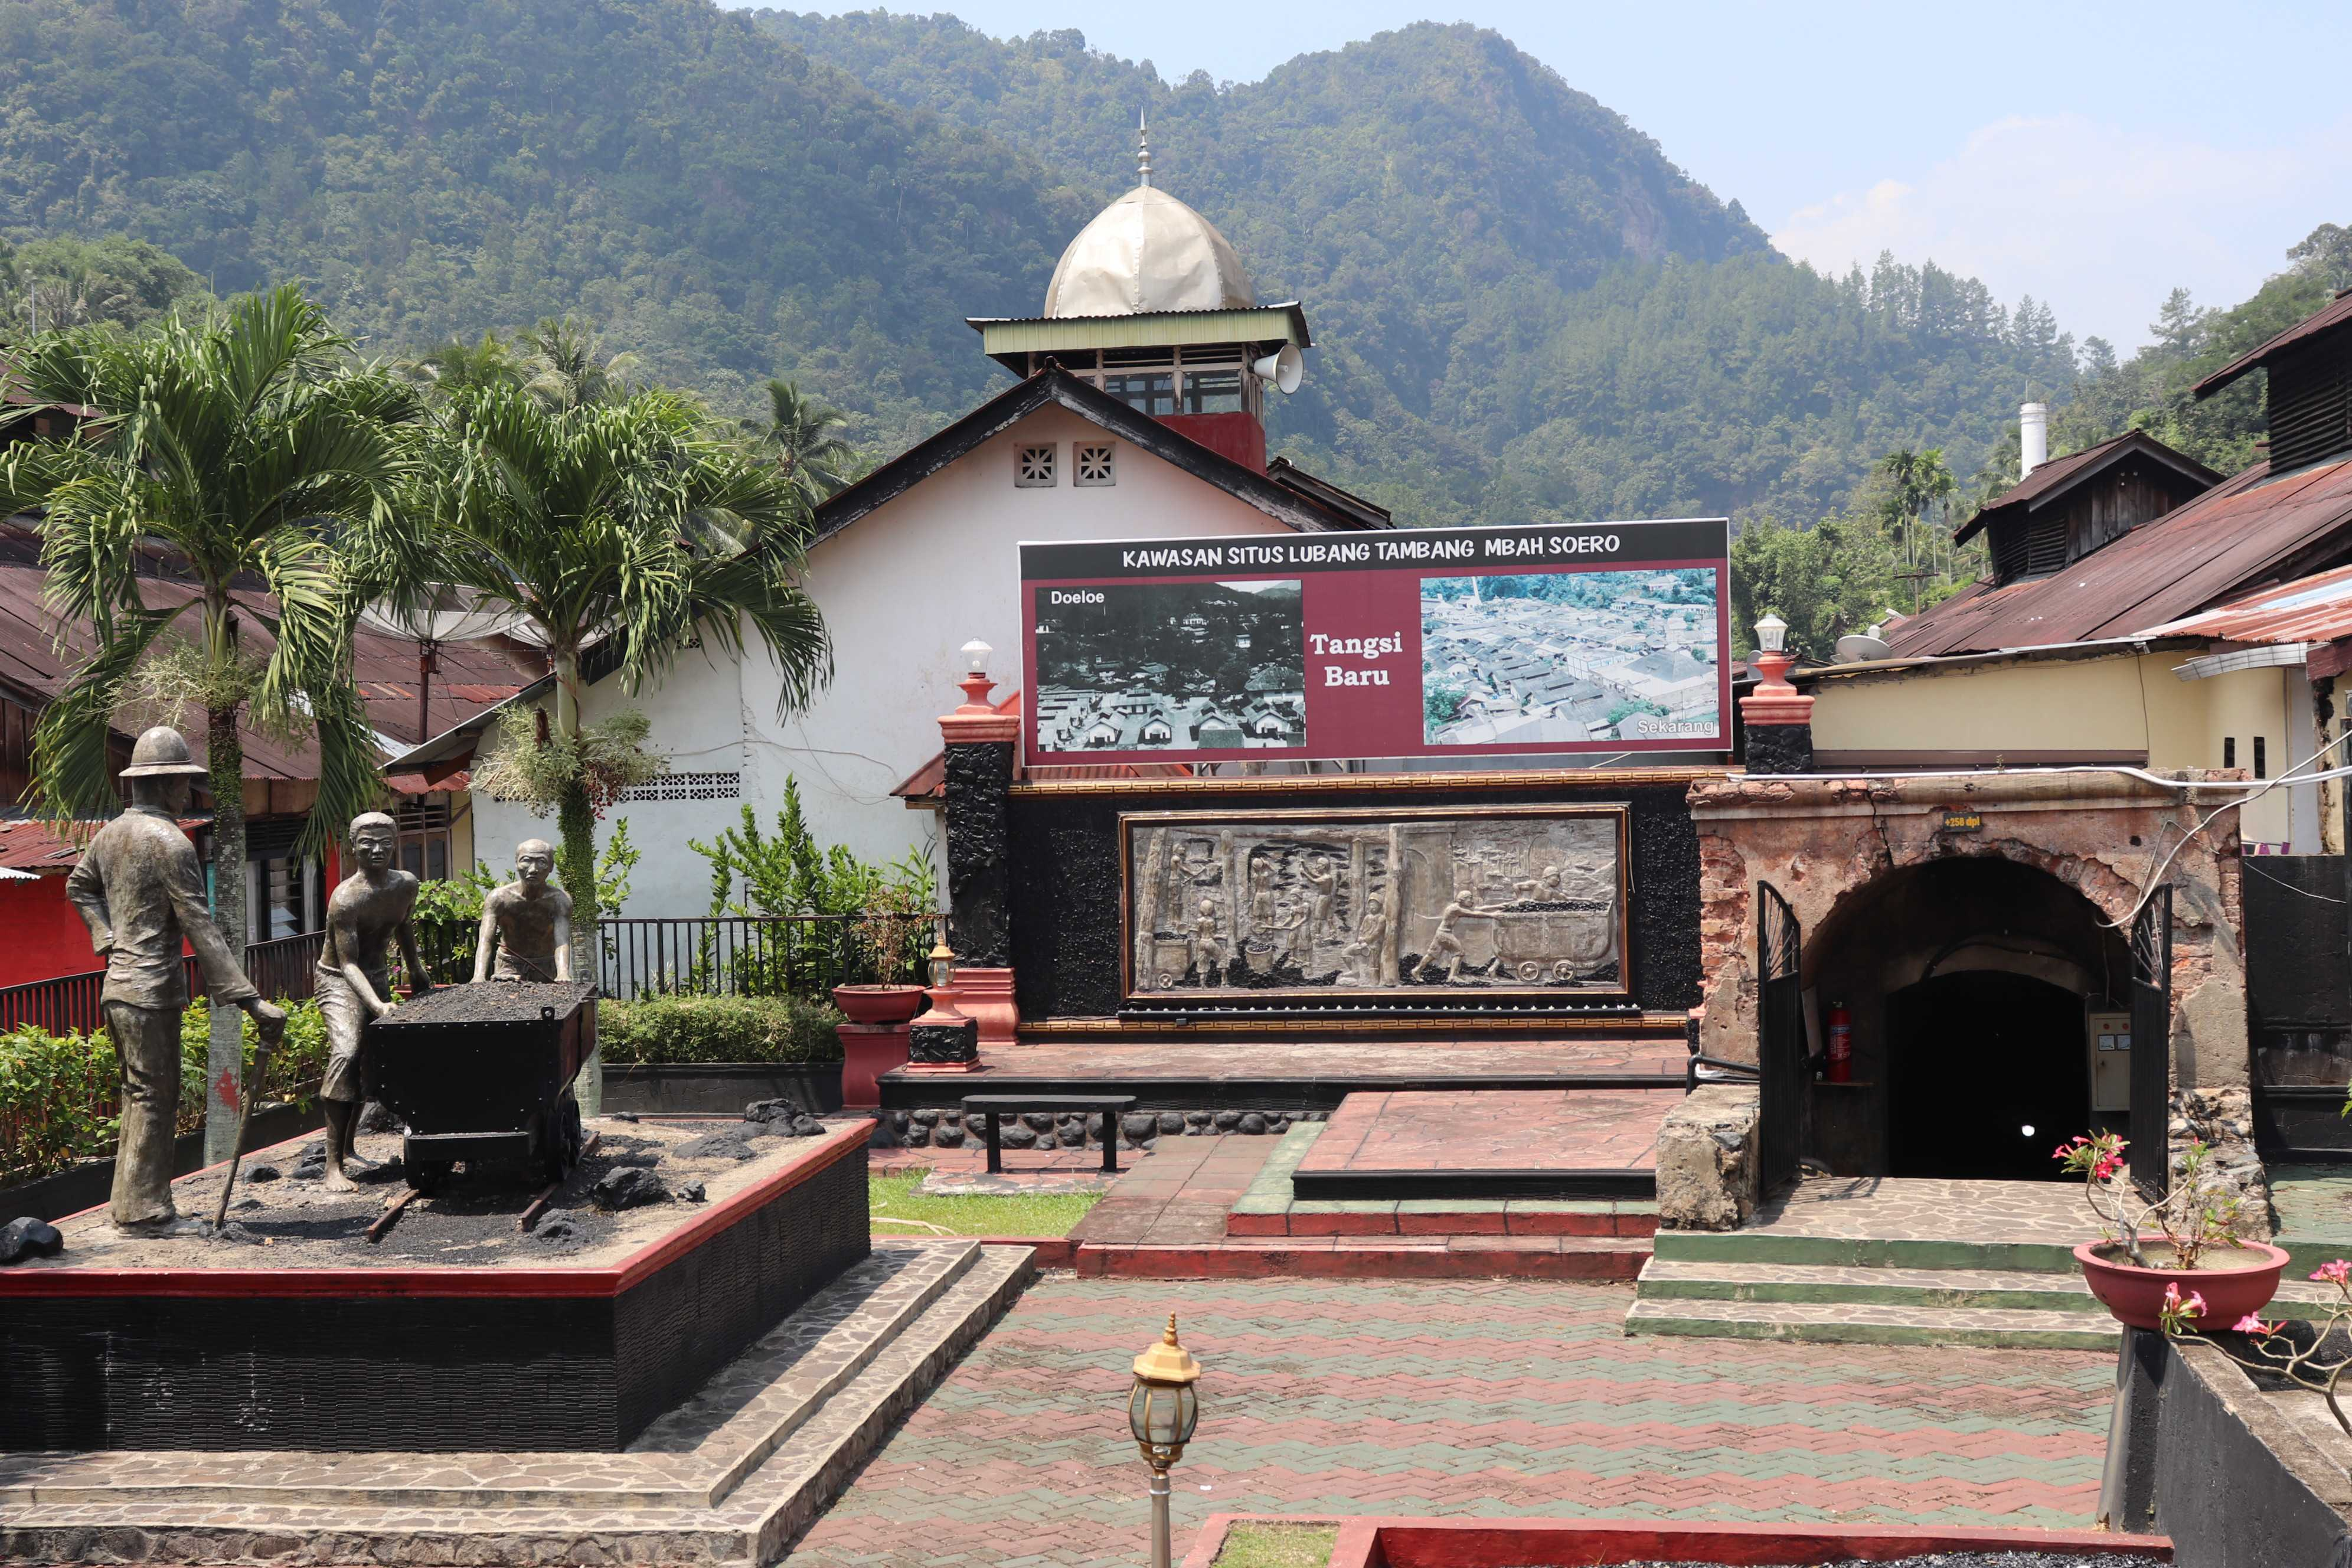 Jadi Warisan Budaya Dunia ke-5 Indonesia, KPKNL Padang telusuri bekas pertambangan batubara, Lubang Mbah Soero Sawahlunto